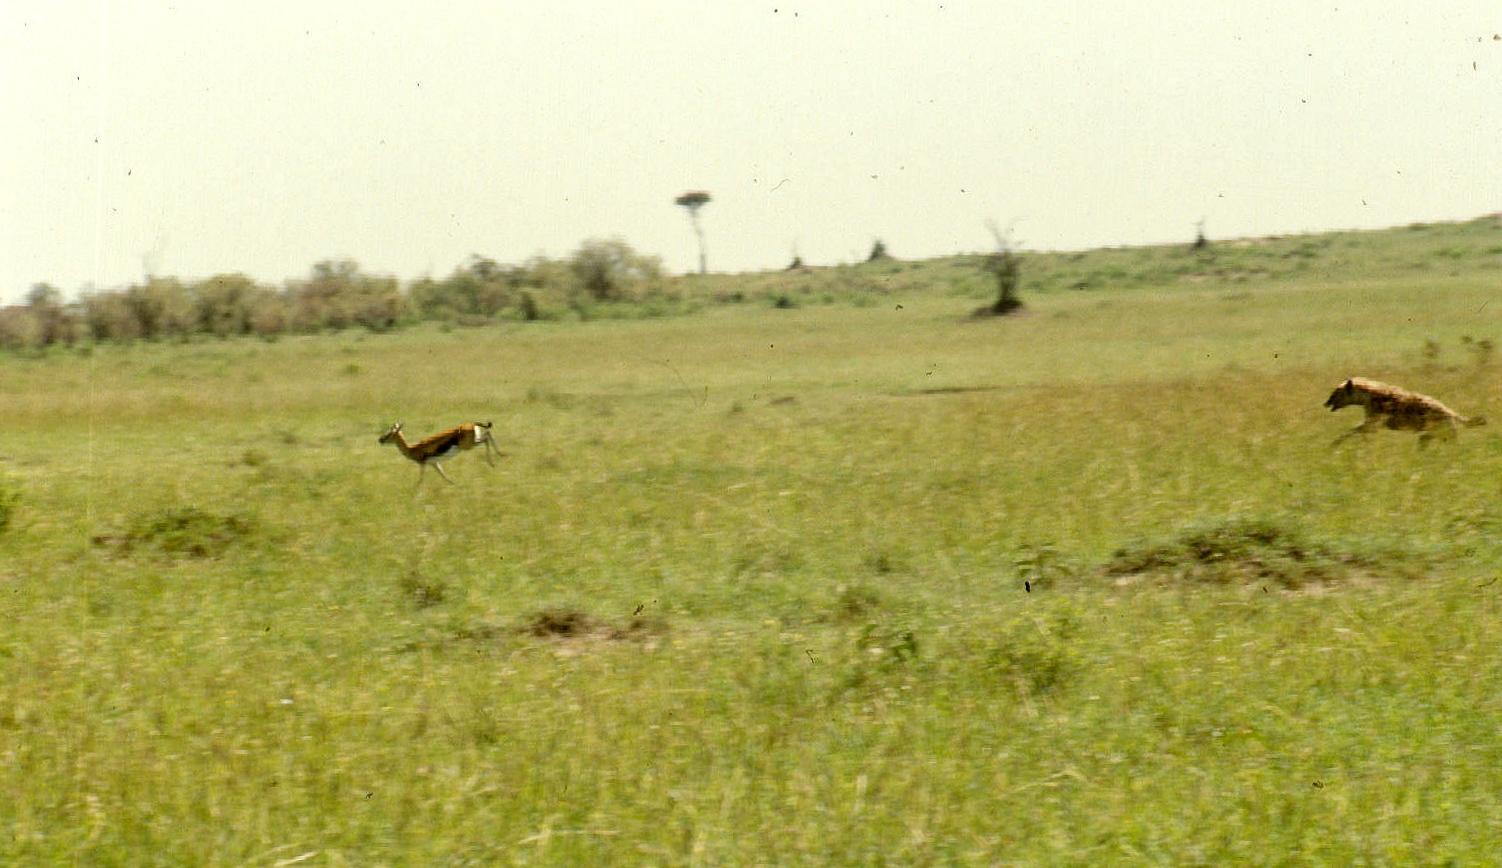 m mara ...hyena chasing thomson gazelle